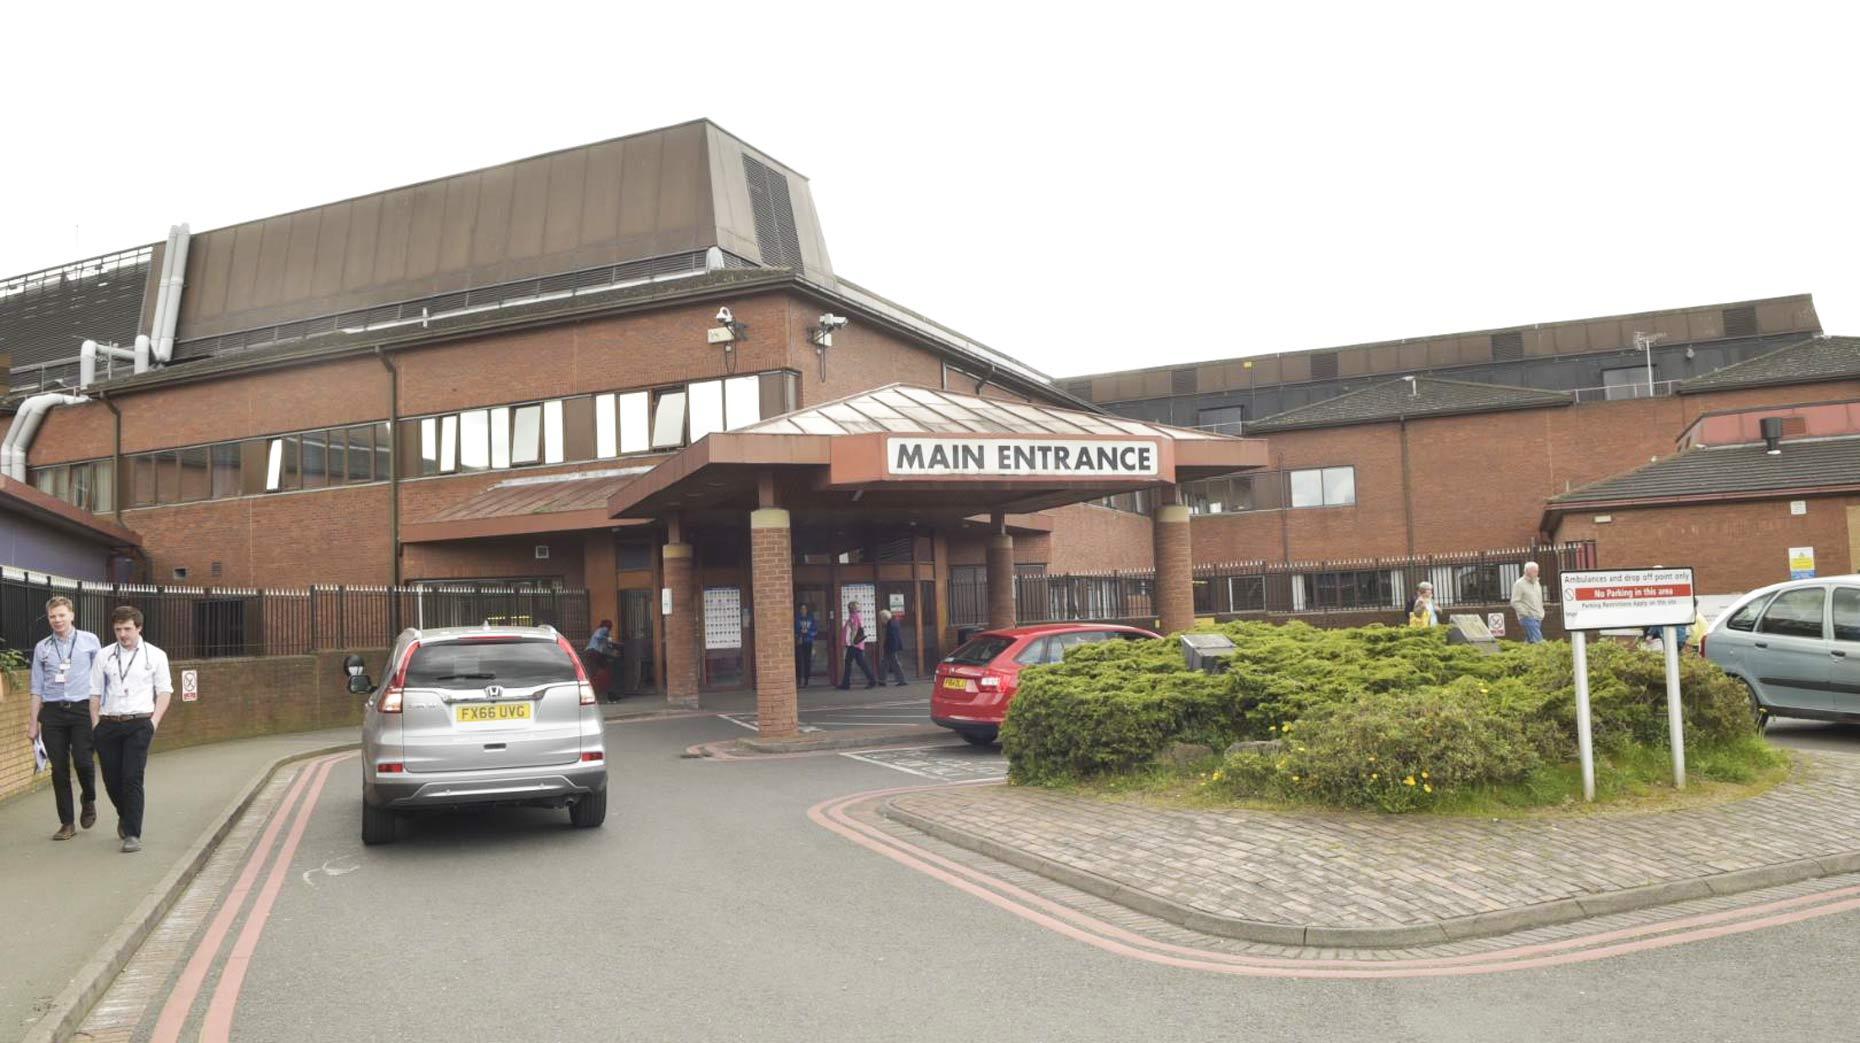 'Inadequate': Hospitals trust behind Pilgrim Hospital back in special measures